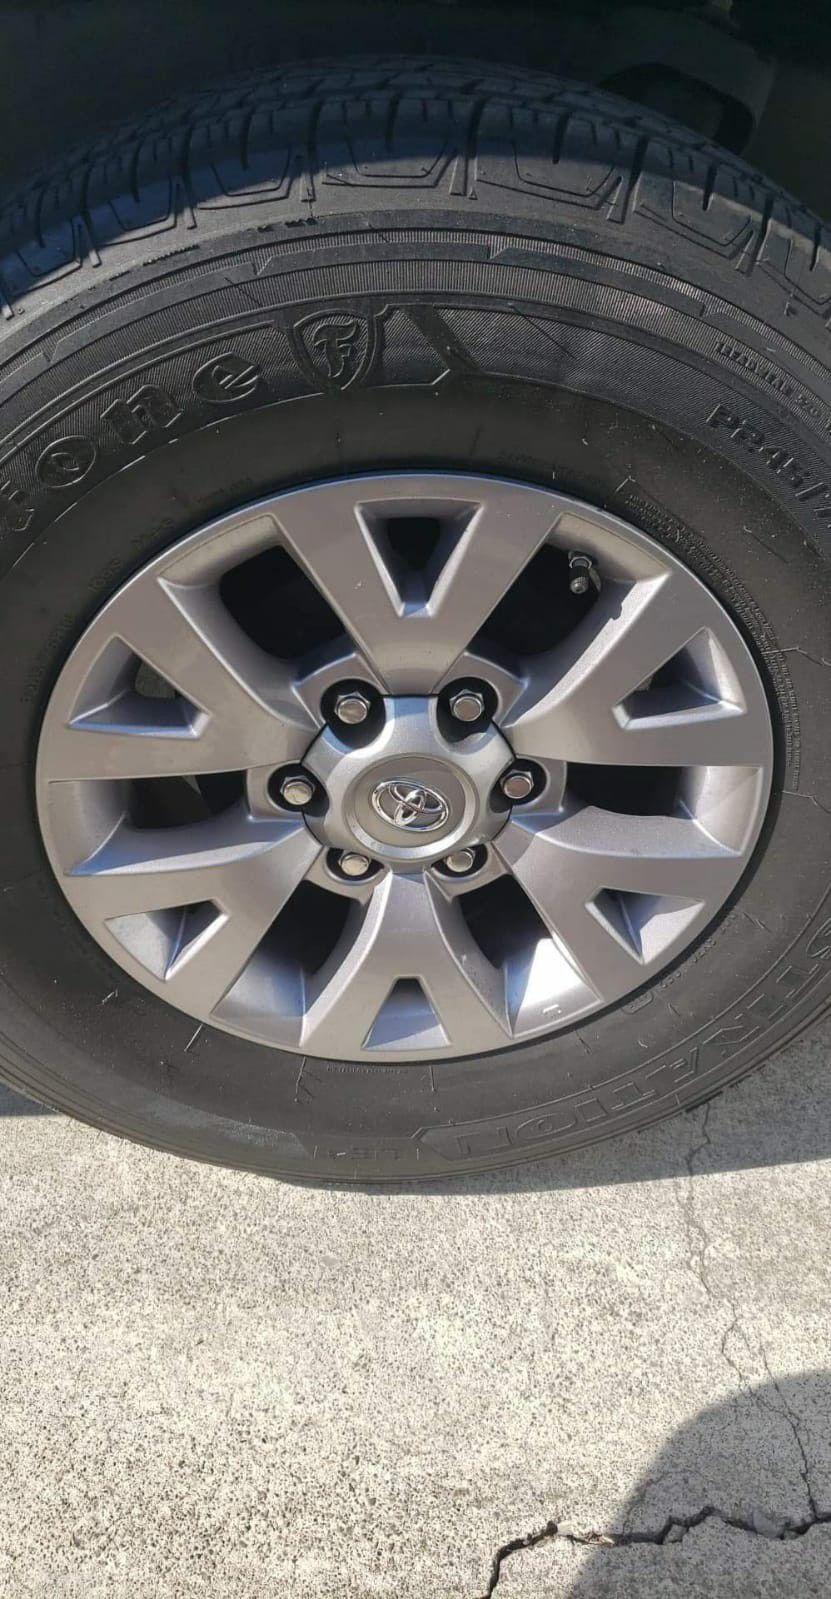 2016 Tacoma Rims & tires set